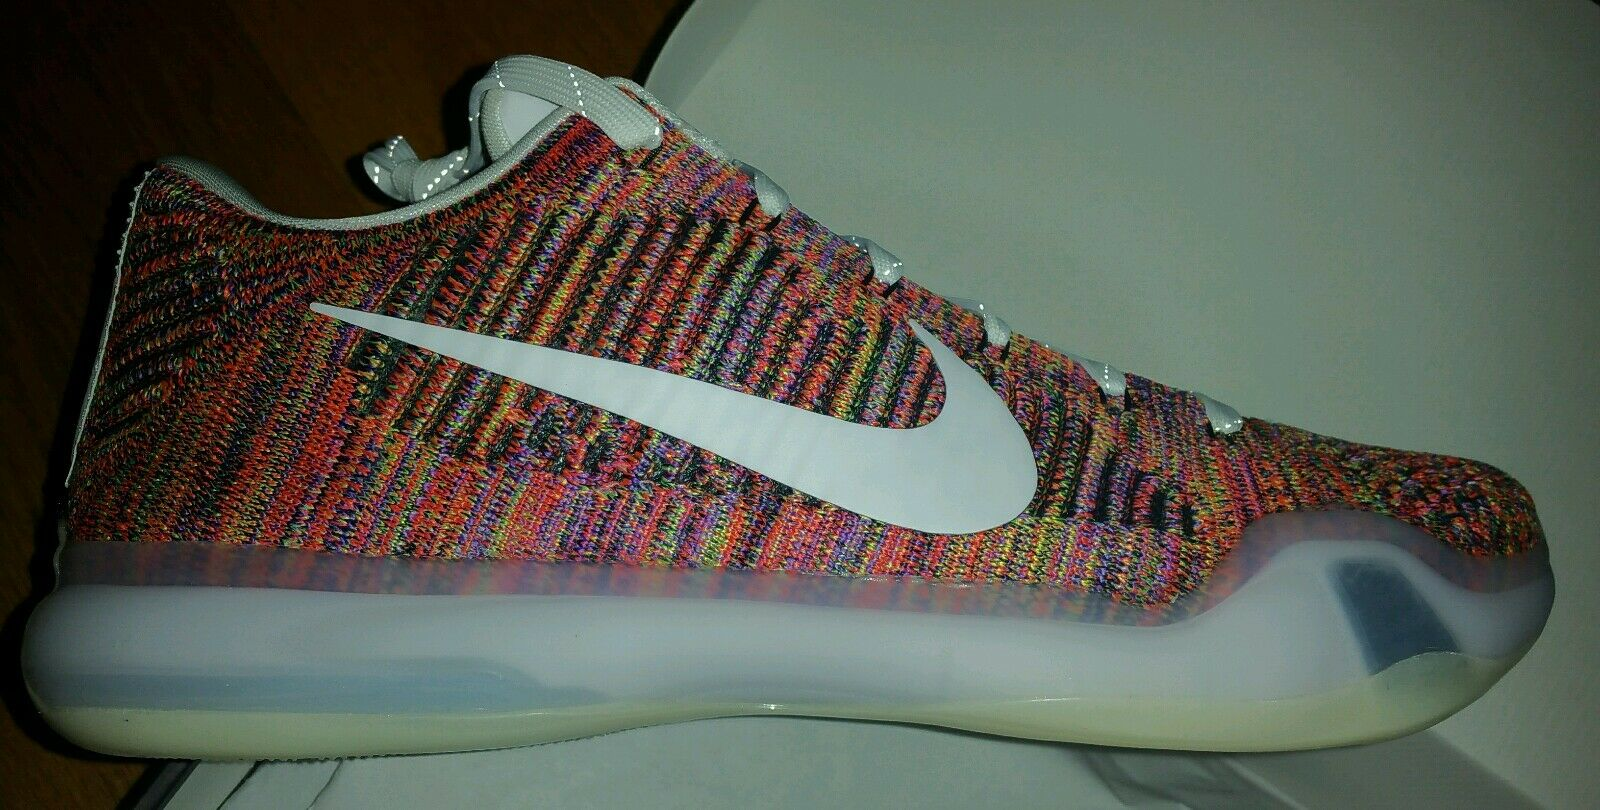 Nike Zoom Kobe X Elite iD size 14 Multicolor Flyknit MC Mambacolor NikeID white